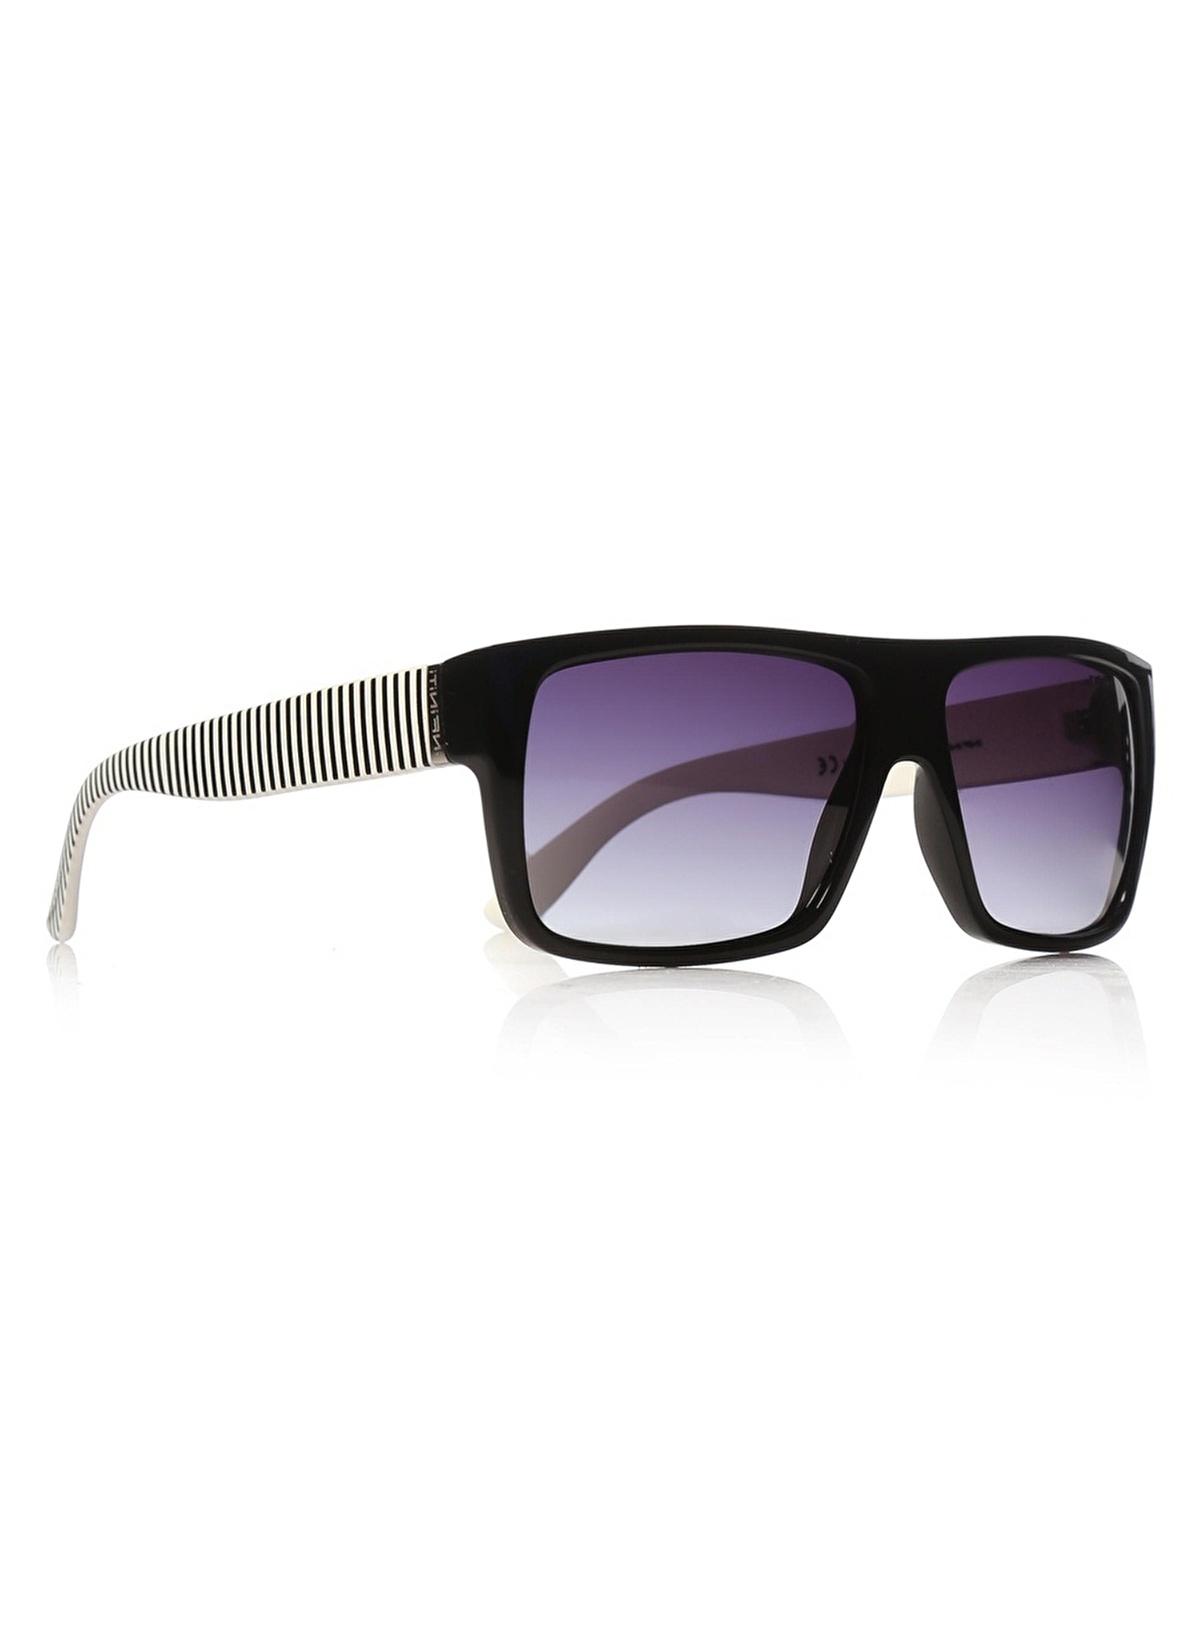 İnfiniti Design Güneş Gözlüğü Id 3981 144 Güneş Gözlüğü – 68.99 TL